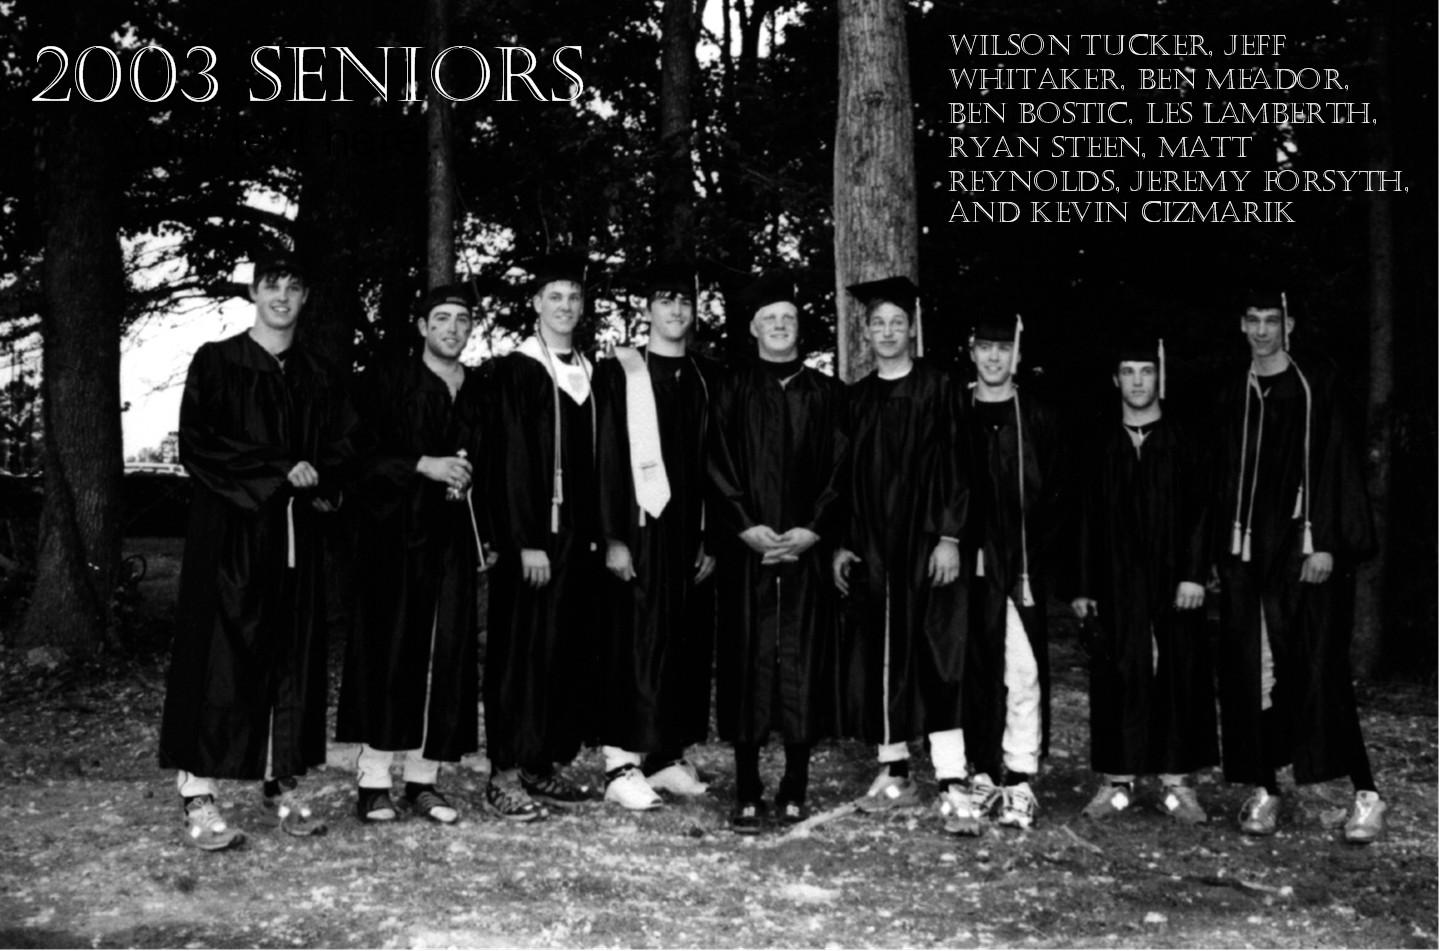 2003 Seniors